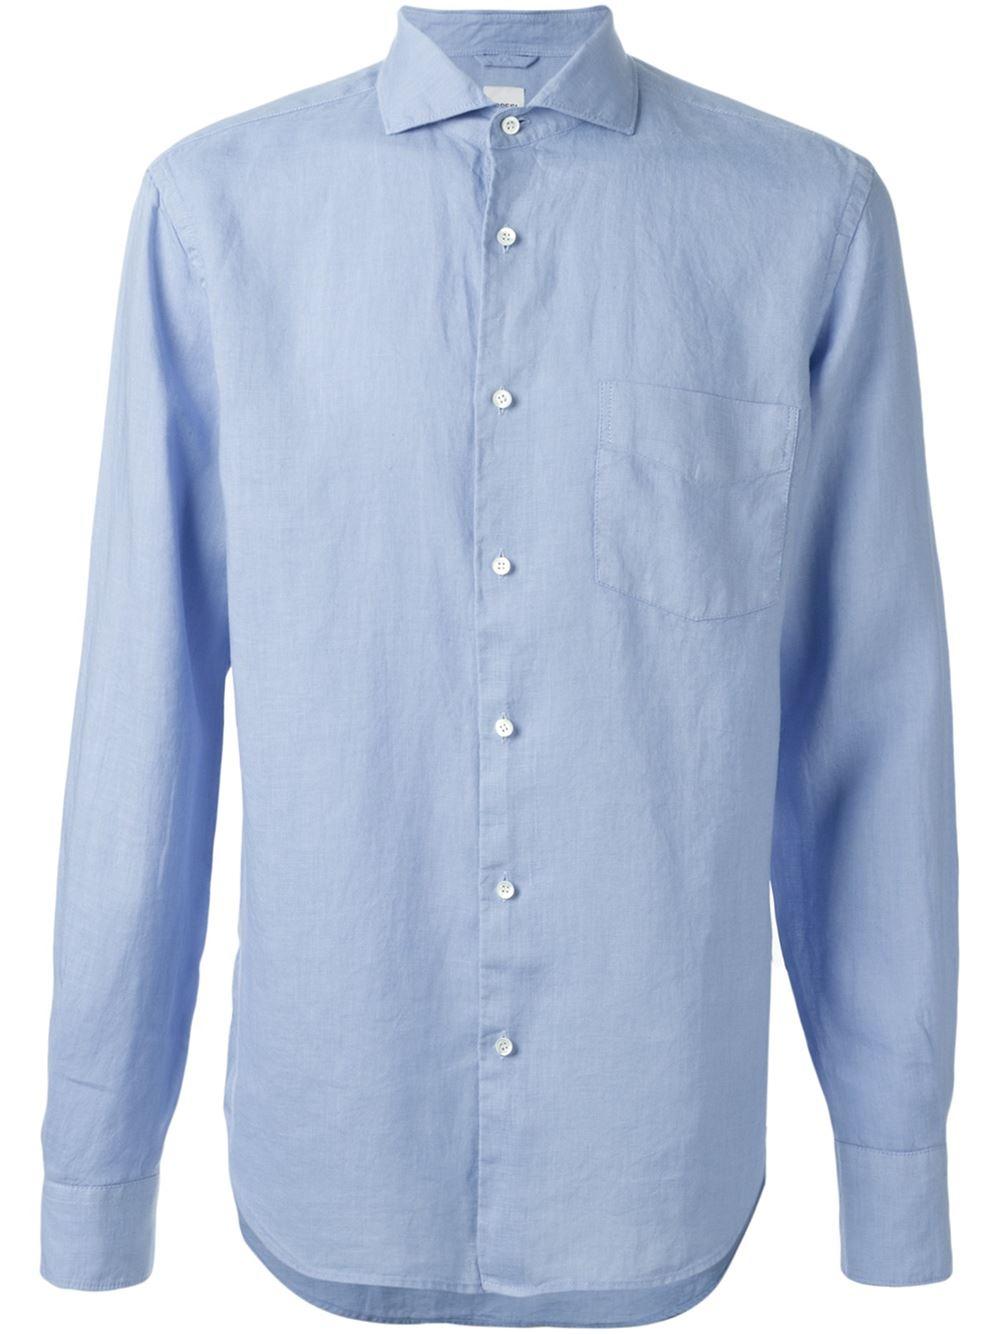 Aspesi spread collar shirt in blue for men lyst for What is a spread collar shirt